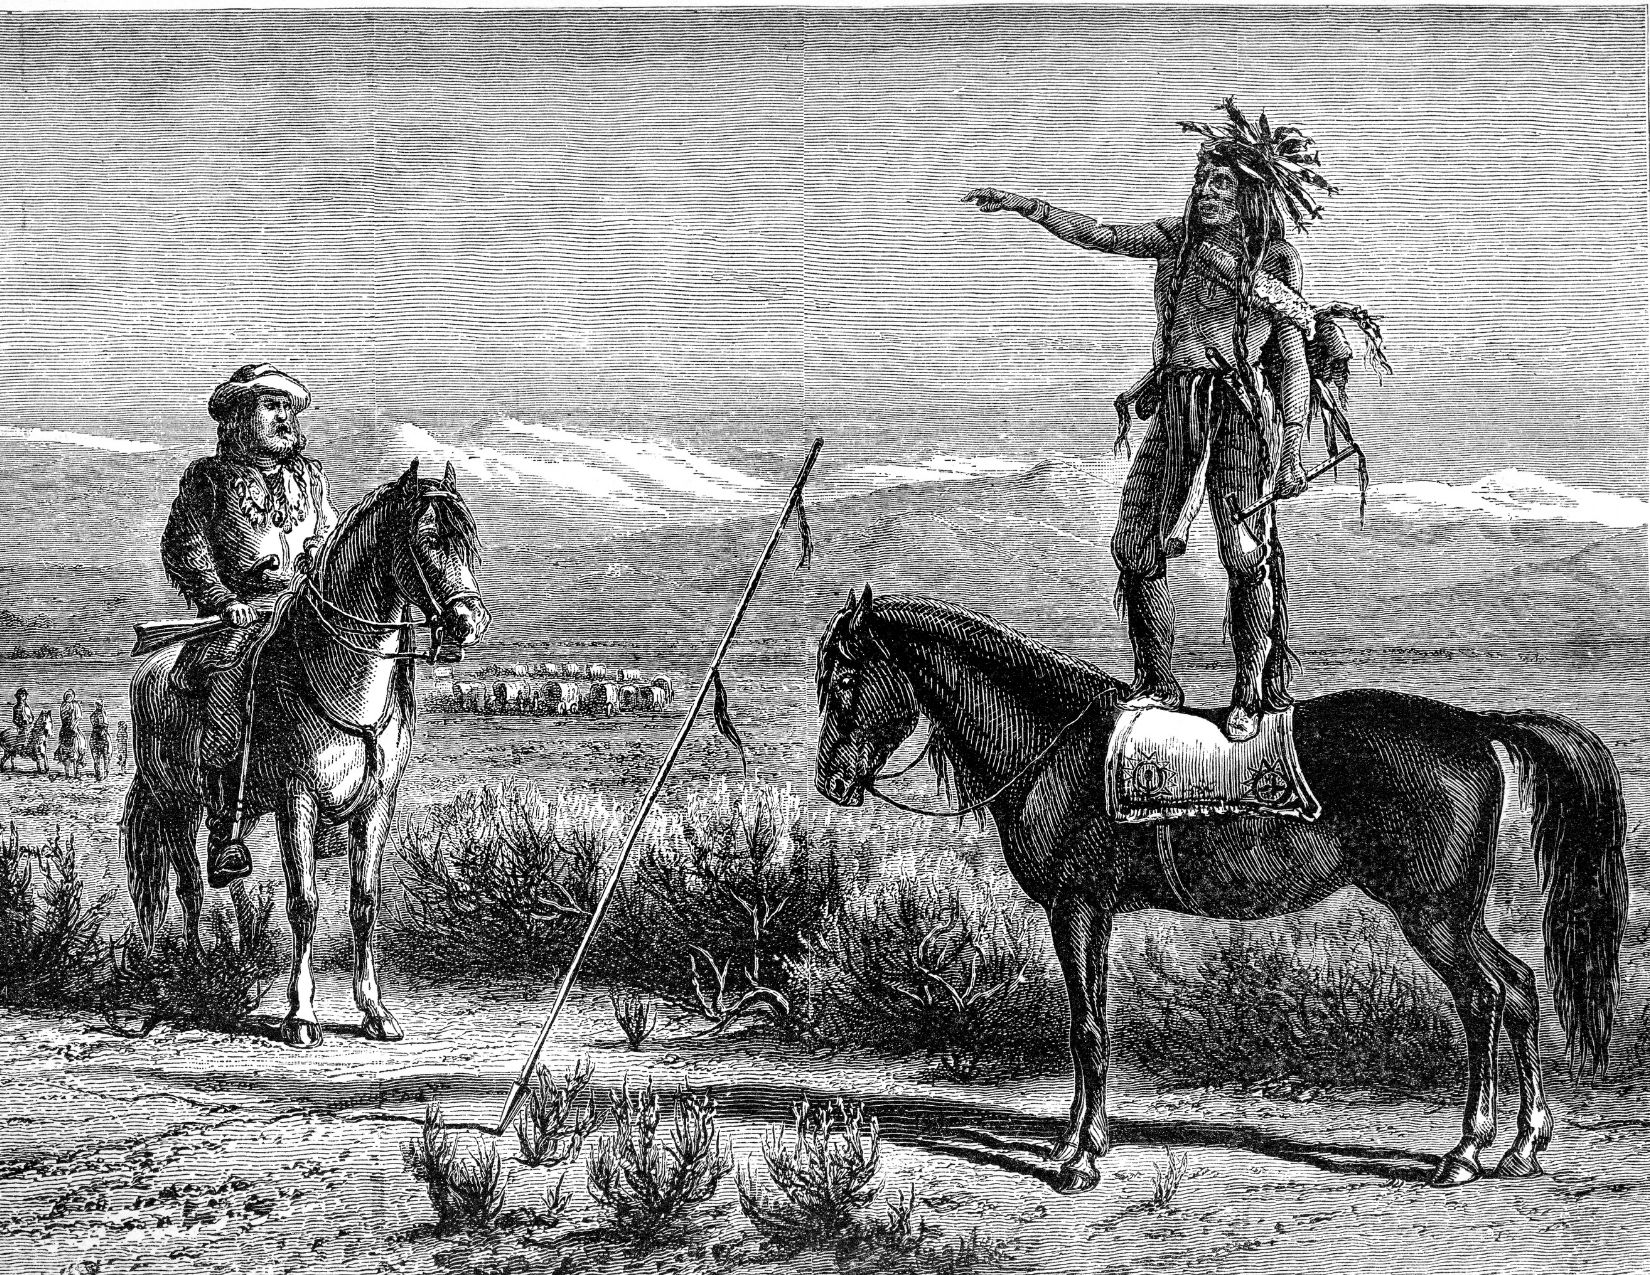 Black and white sketch of native american standing on horse talking to European explorer on horseback